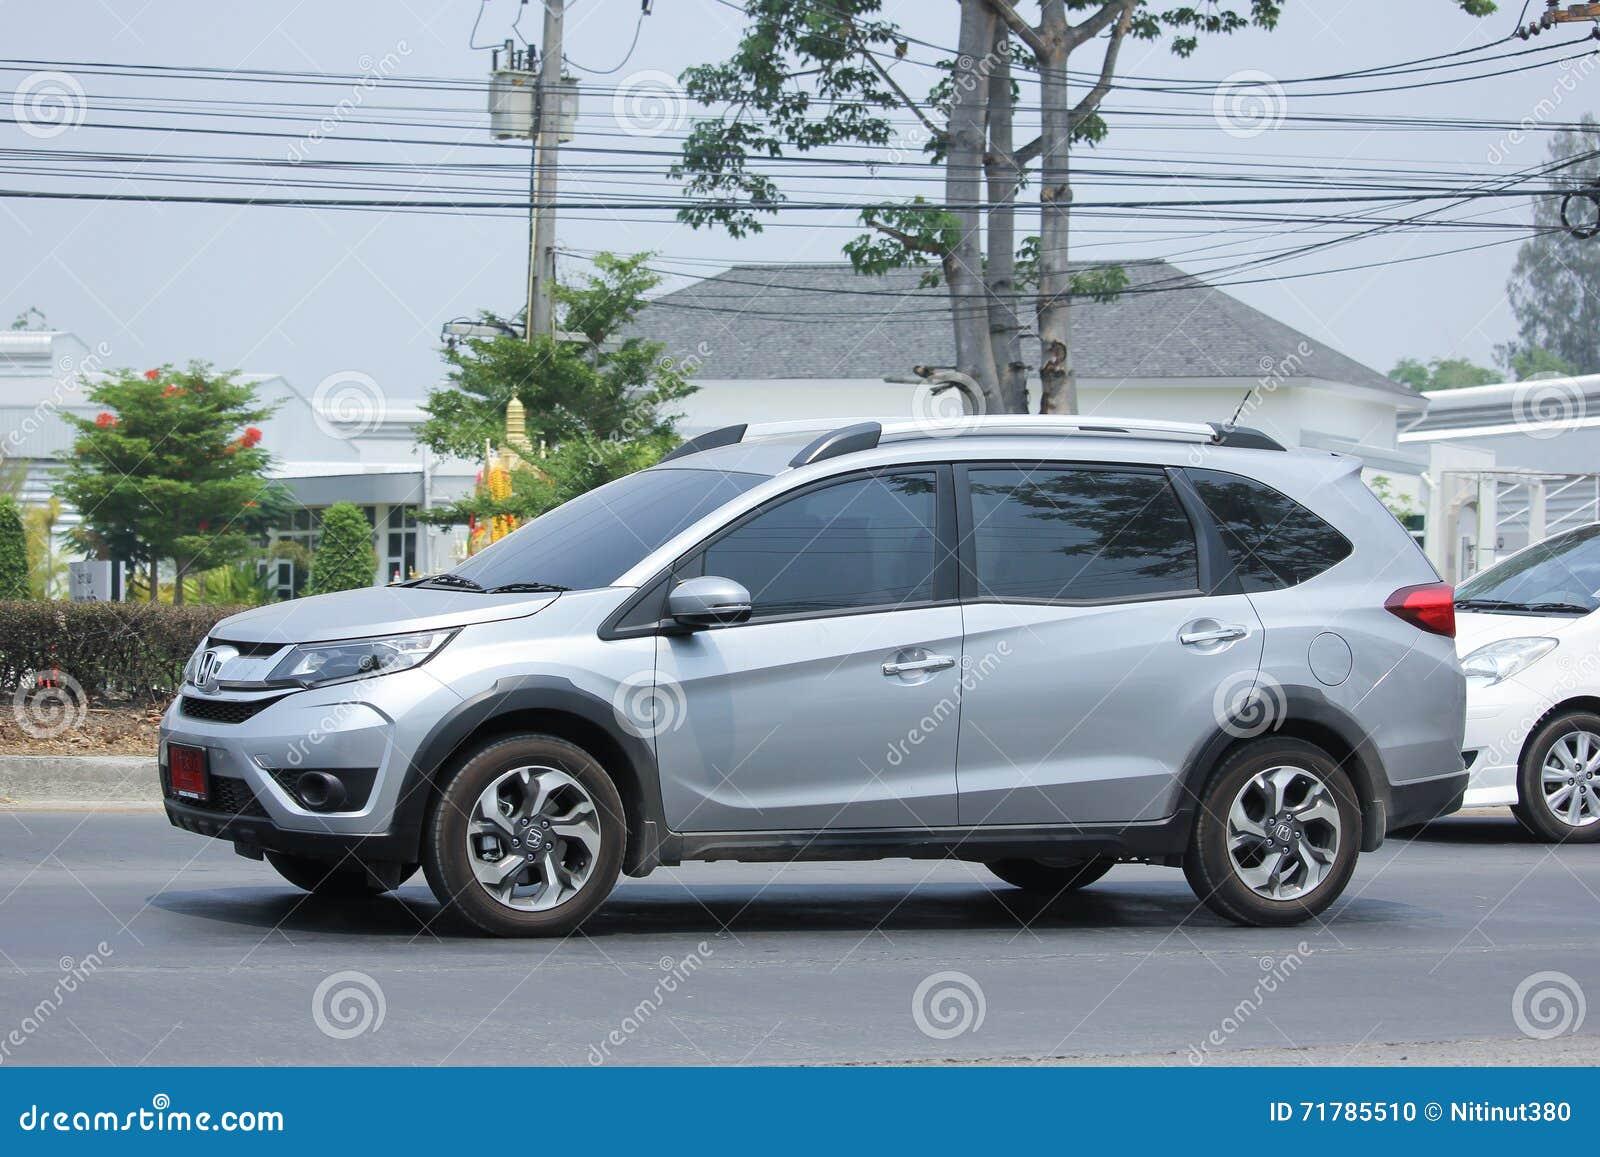 Buy New Car Thailand